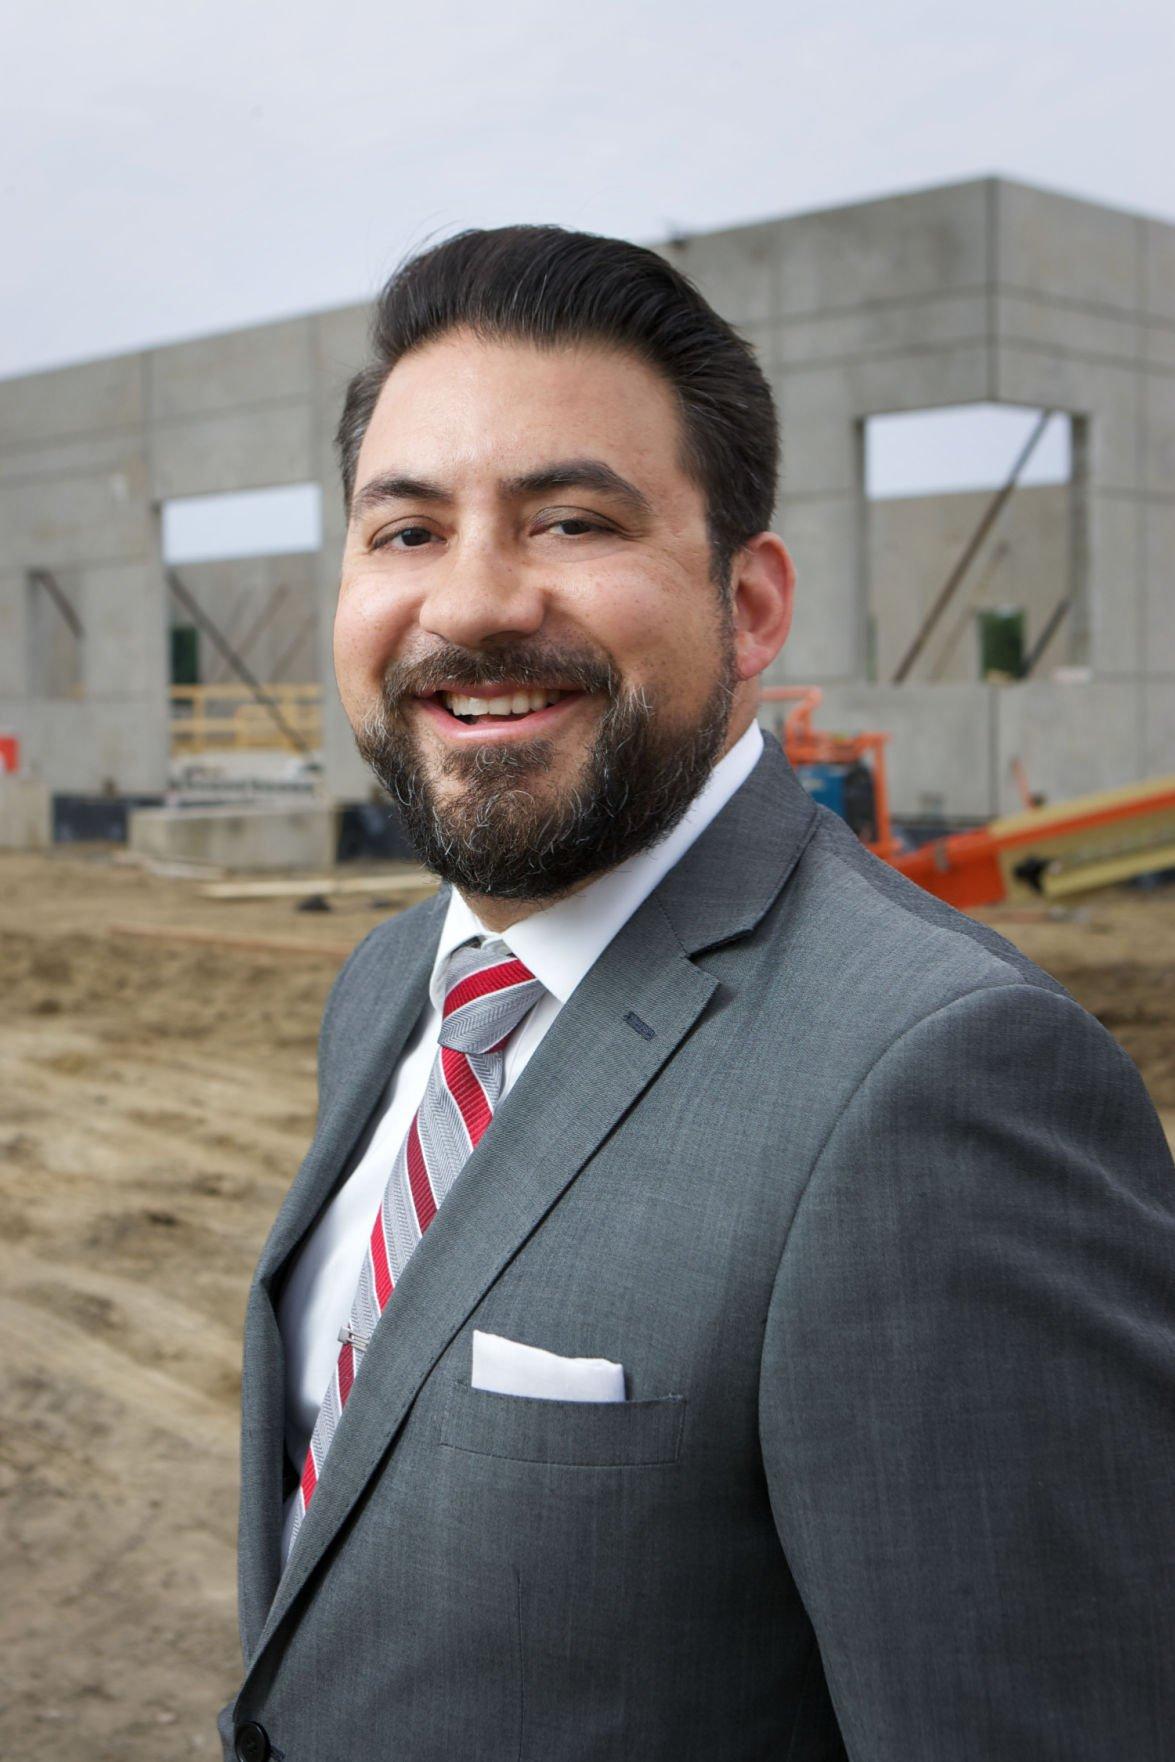 20 UNDER 40: Matt Saltanovitz combines business, economics and commitment to NWI